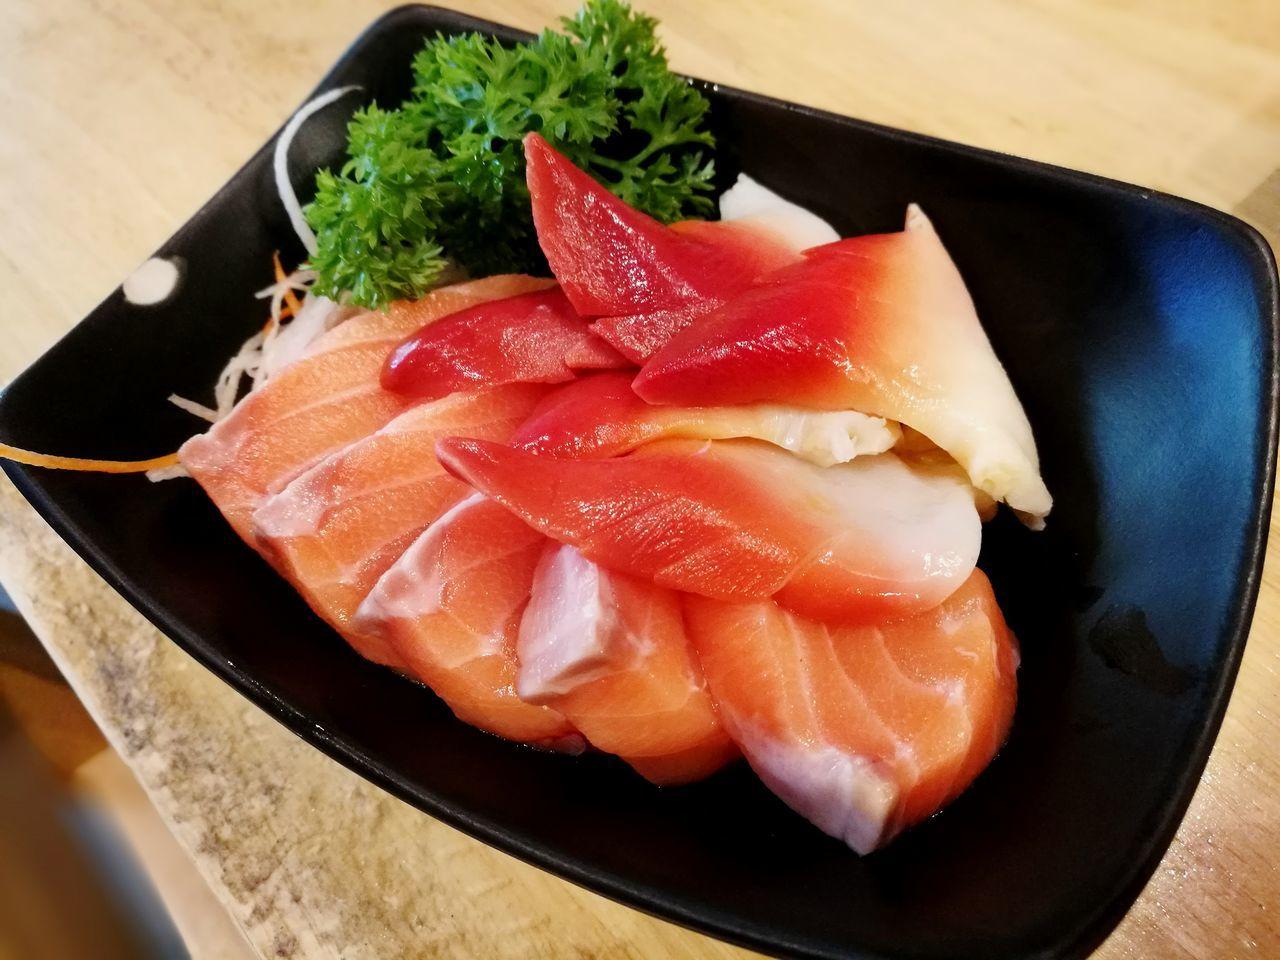 Food Food And Drink Raw Food Sashimi  Sashimi Special Sashimi Platter Sashimi Lunch Sashimilovers Sashimi Dish Lunch Time! Meal Gourmet Lunch! Delicious Lunch Time Food State Lunch Break Lunch Lunchtime Delicious ♡ Food Styling Japanese Food Food And Drink Visual Feast